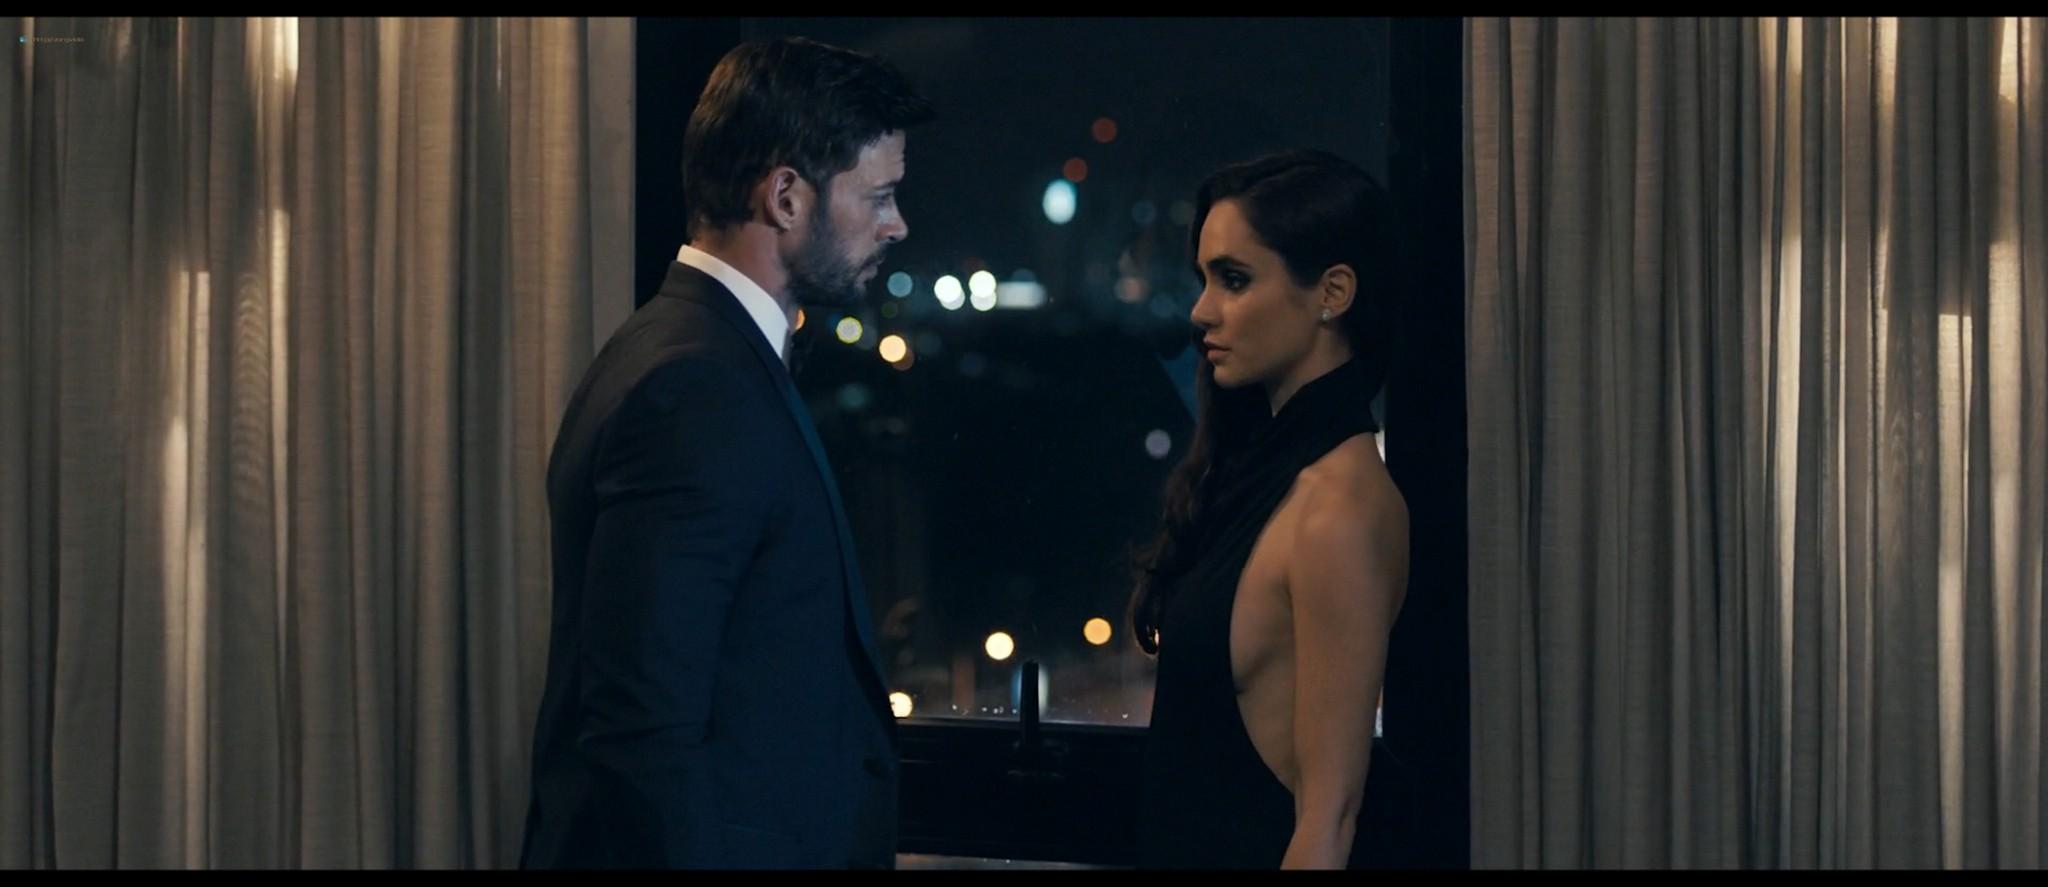 Alicia Sanz nude hot sex - En Brazos de un sesino (2019) HD 1080p Web (8)